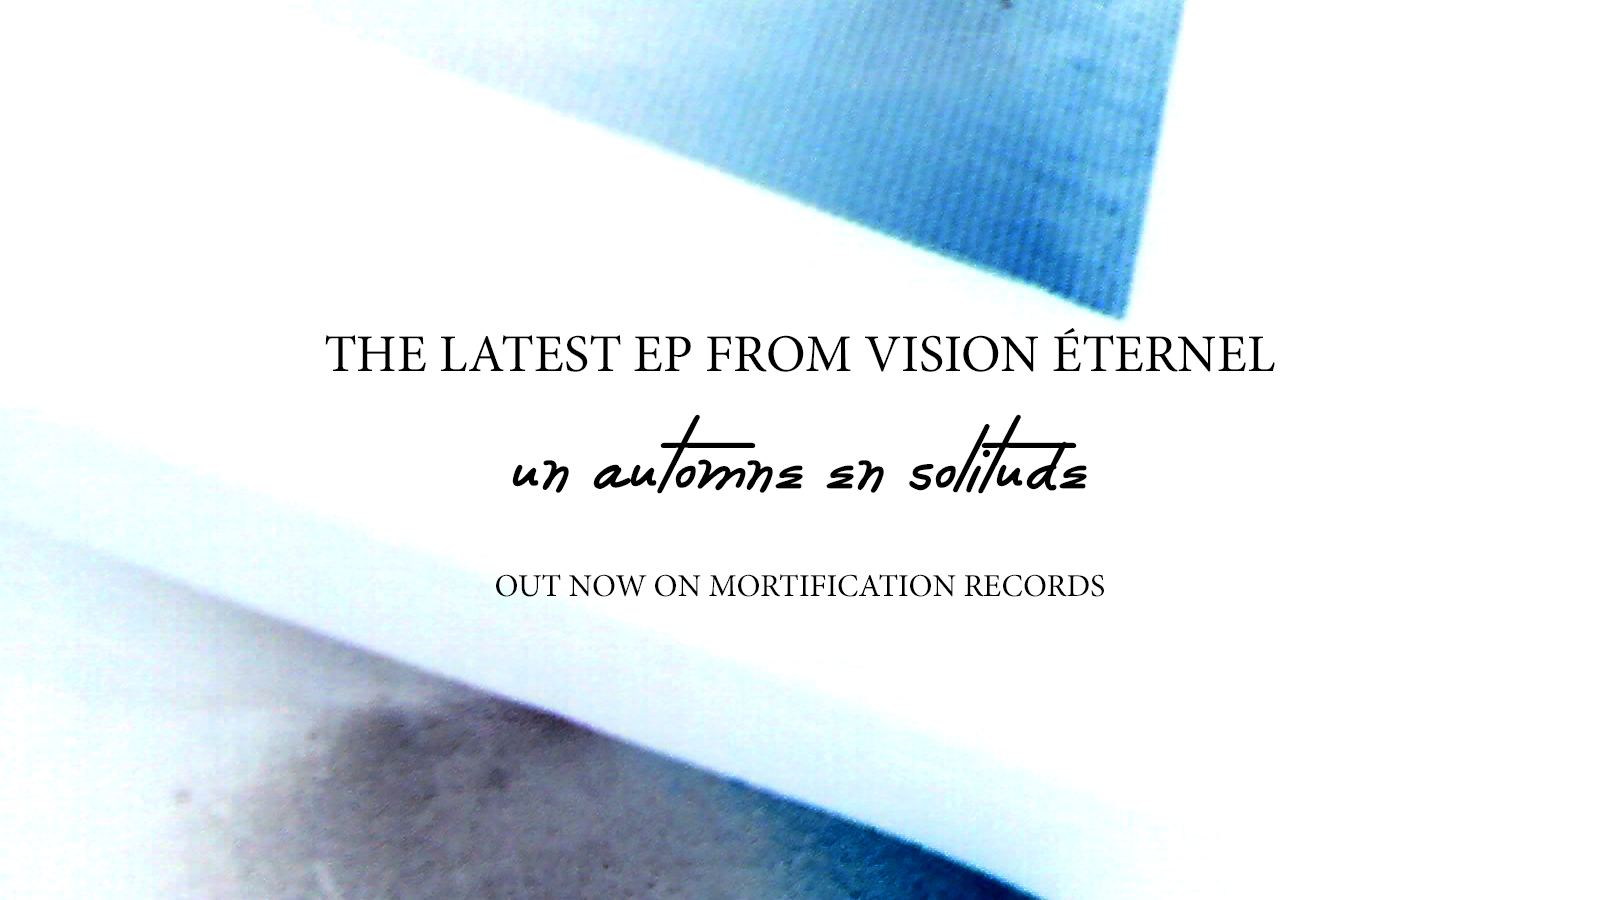 Vision Éternel Un Automne En Solitude EP Is Released